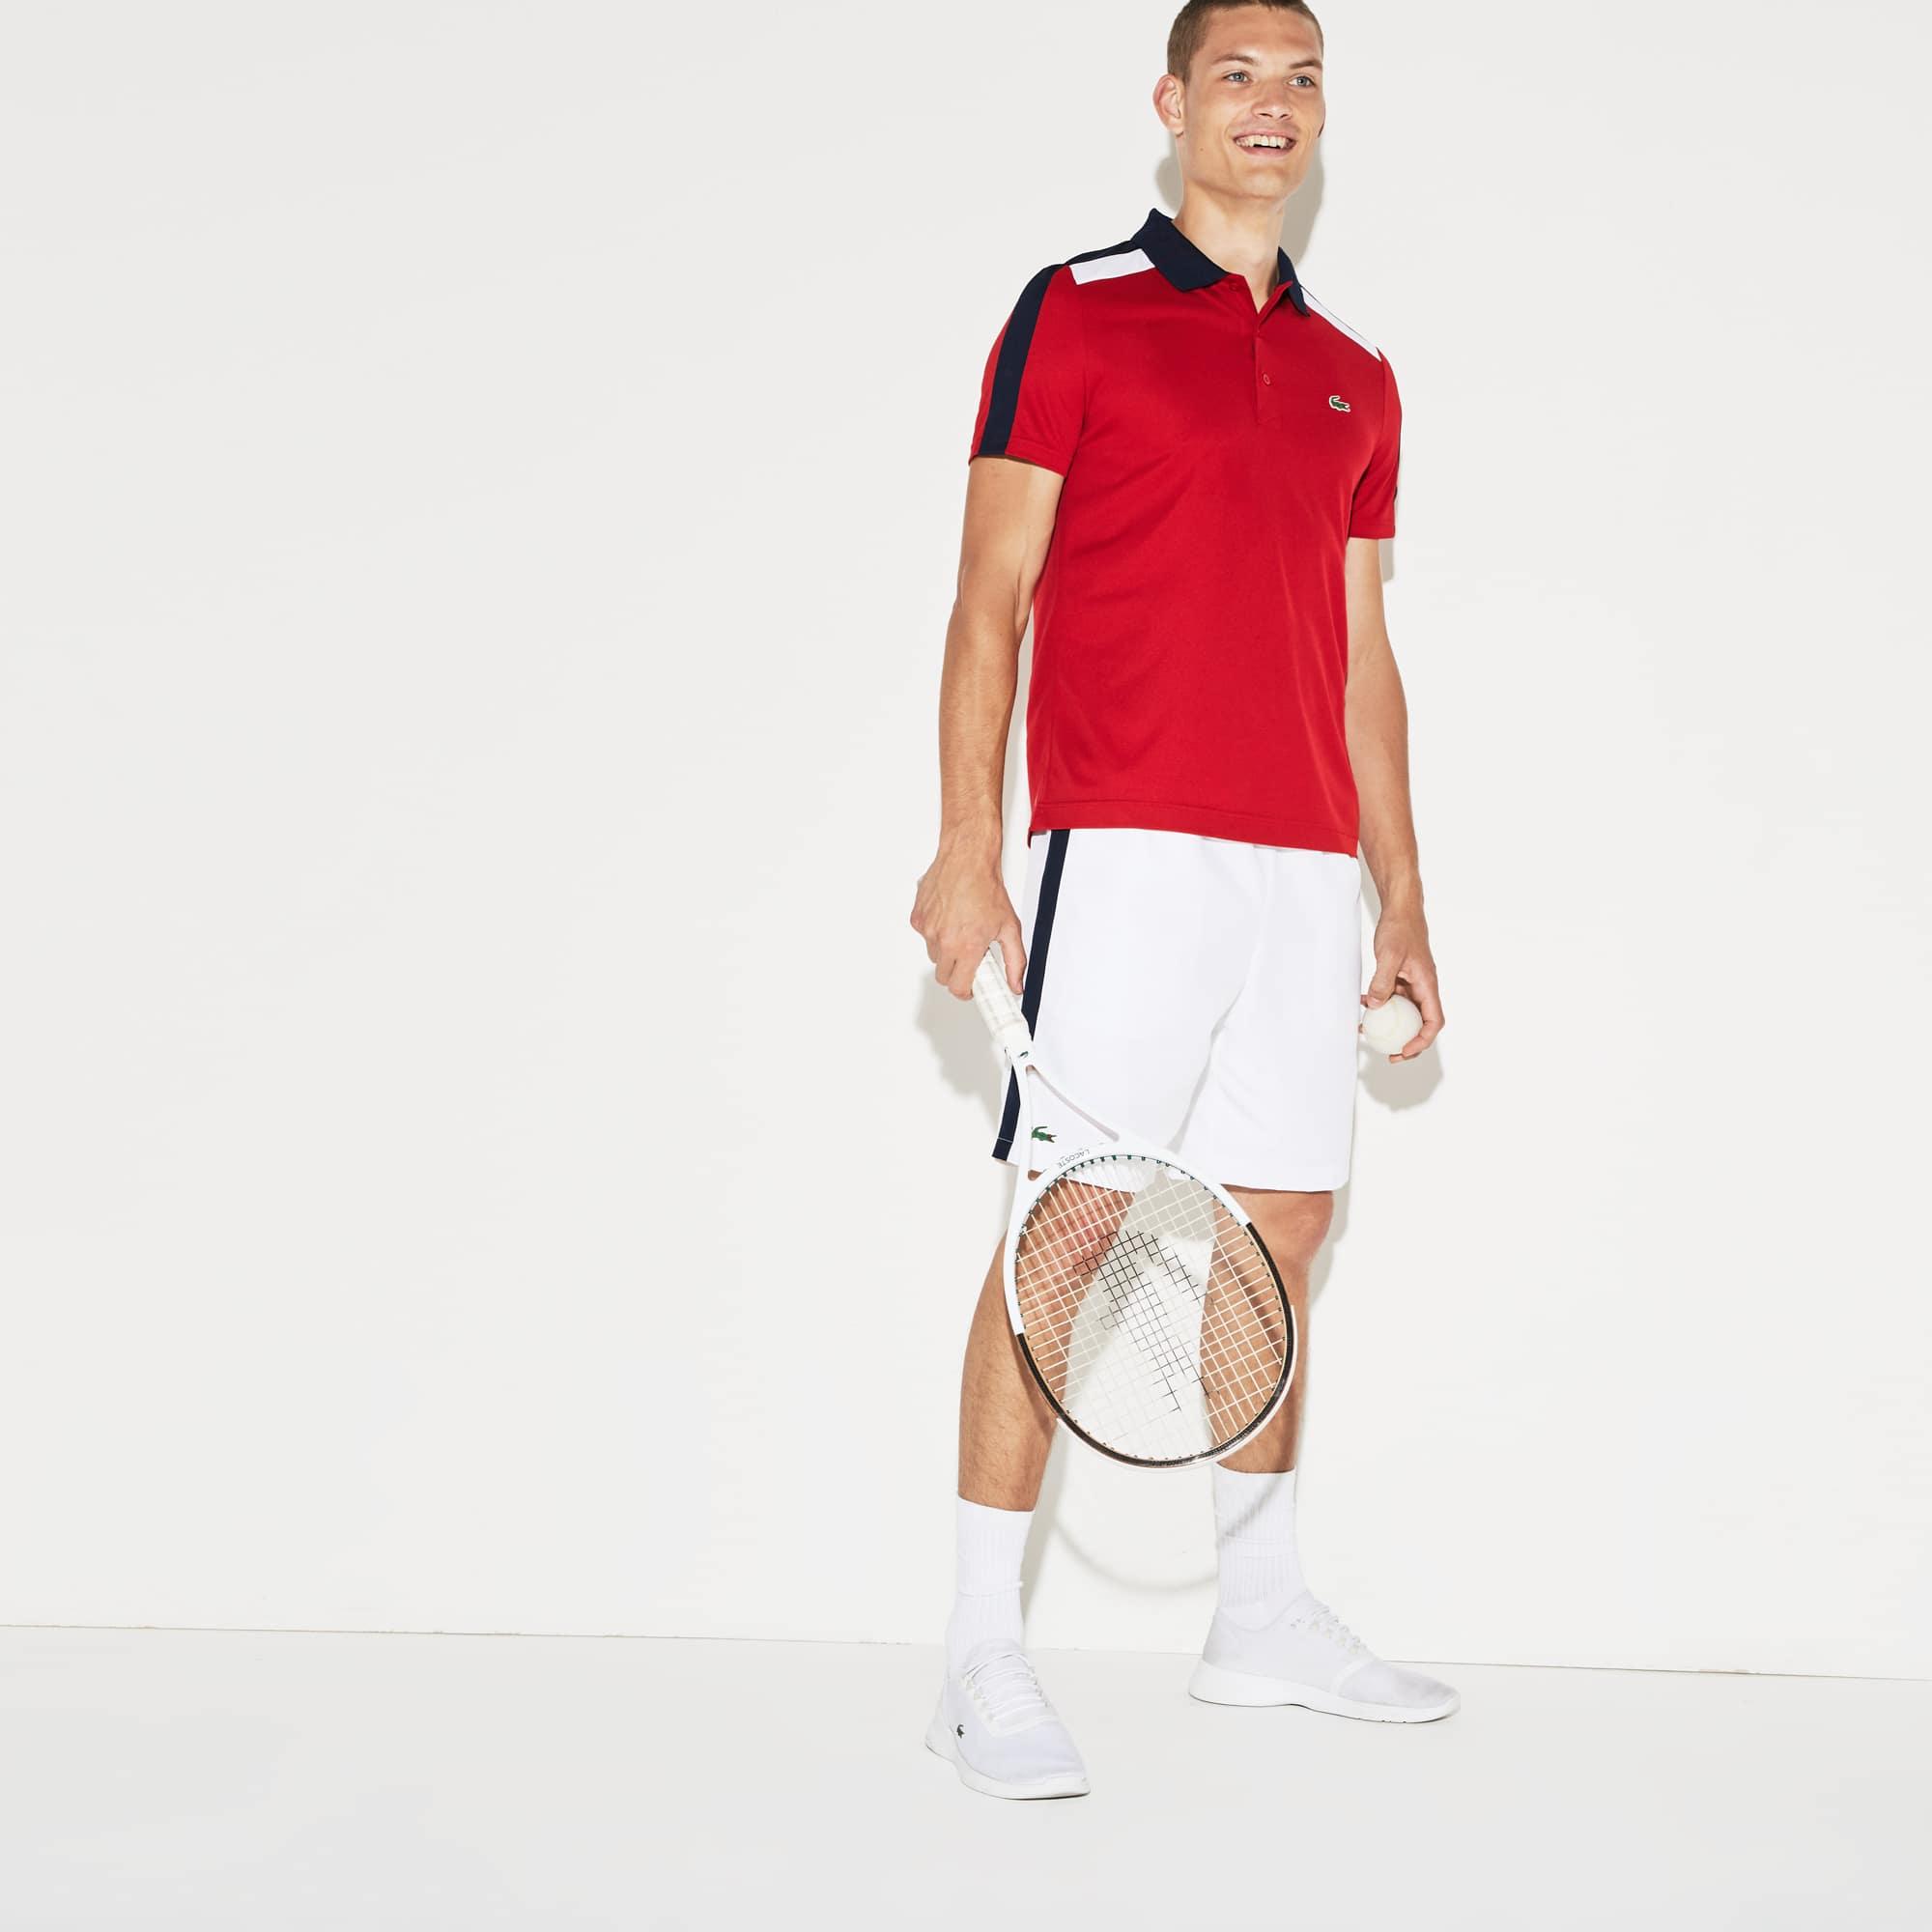 Men's SPORT Colored Bands Taffeta Tennis Shorts